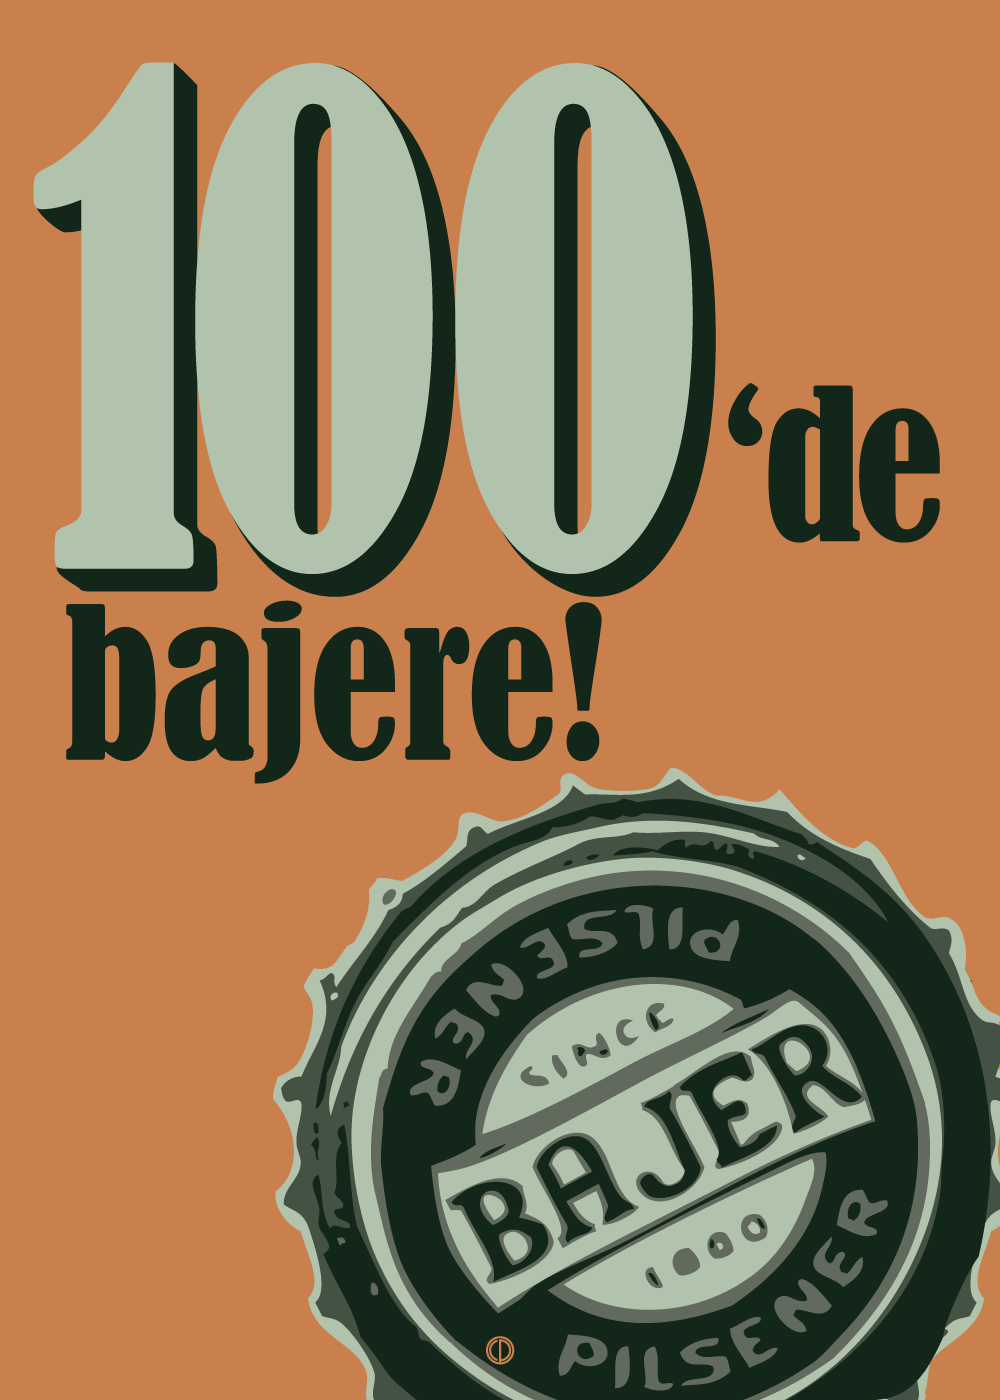 100'de bajere